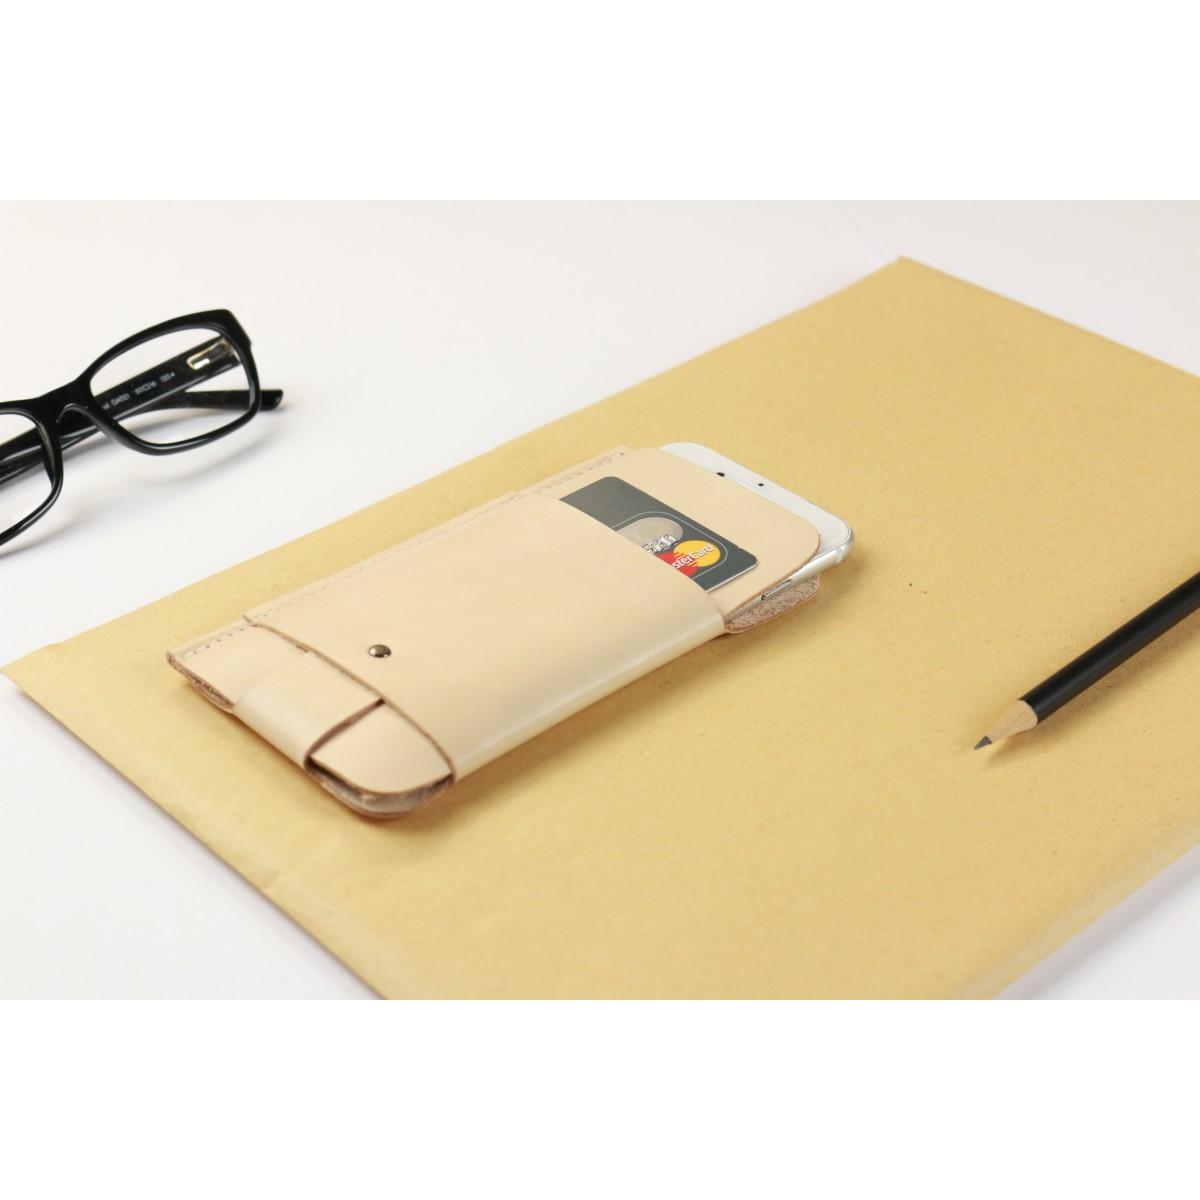 Alexej Nagel iPhone 6 Plus /6S Plus / 7 Slim Fit Hülle aus Leder in Farbe natur [N]